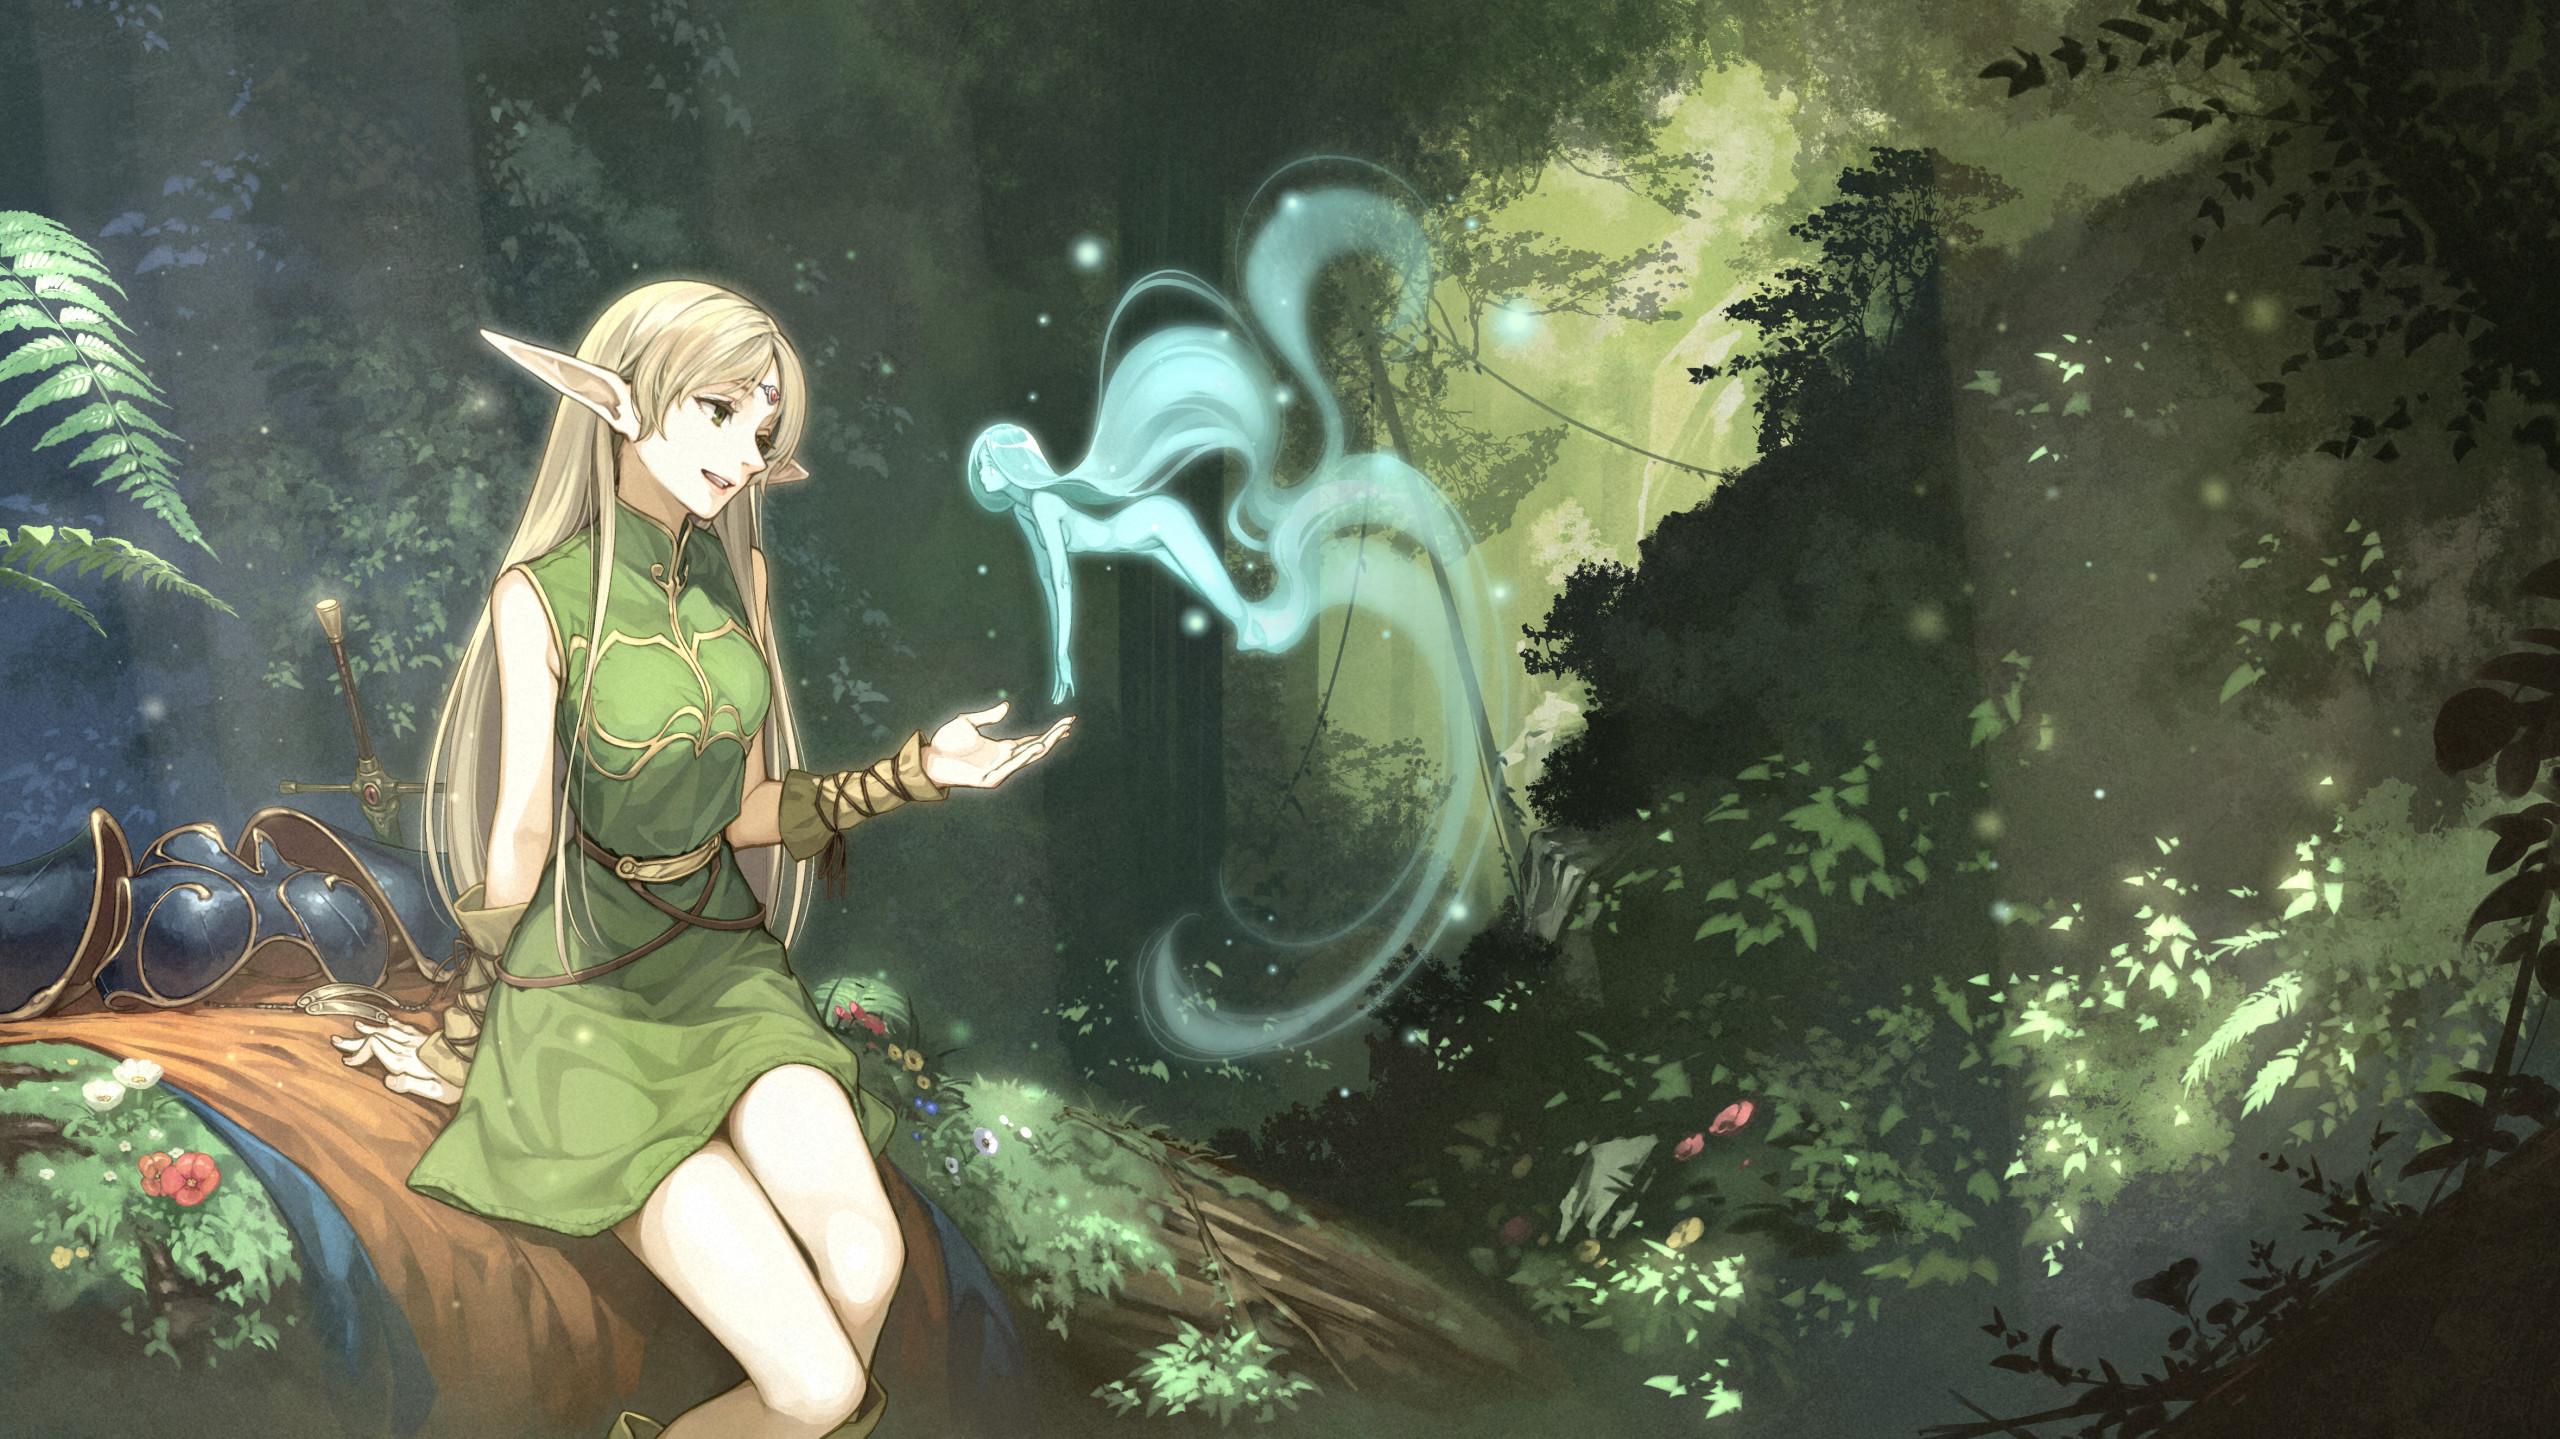 Wallpaper Record Of Lodoss War Deedlit Forest Elven Anime